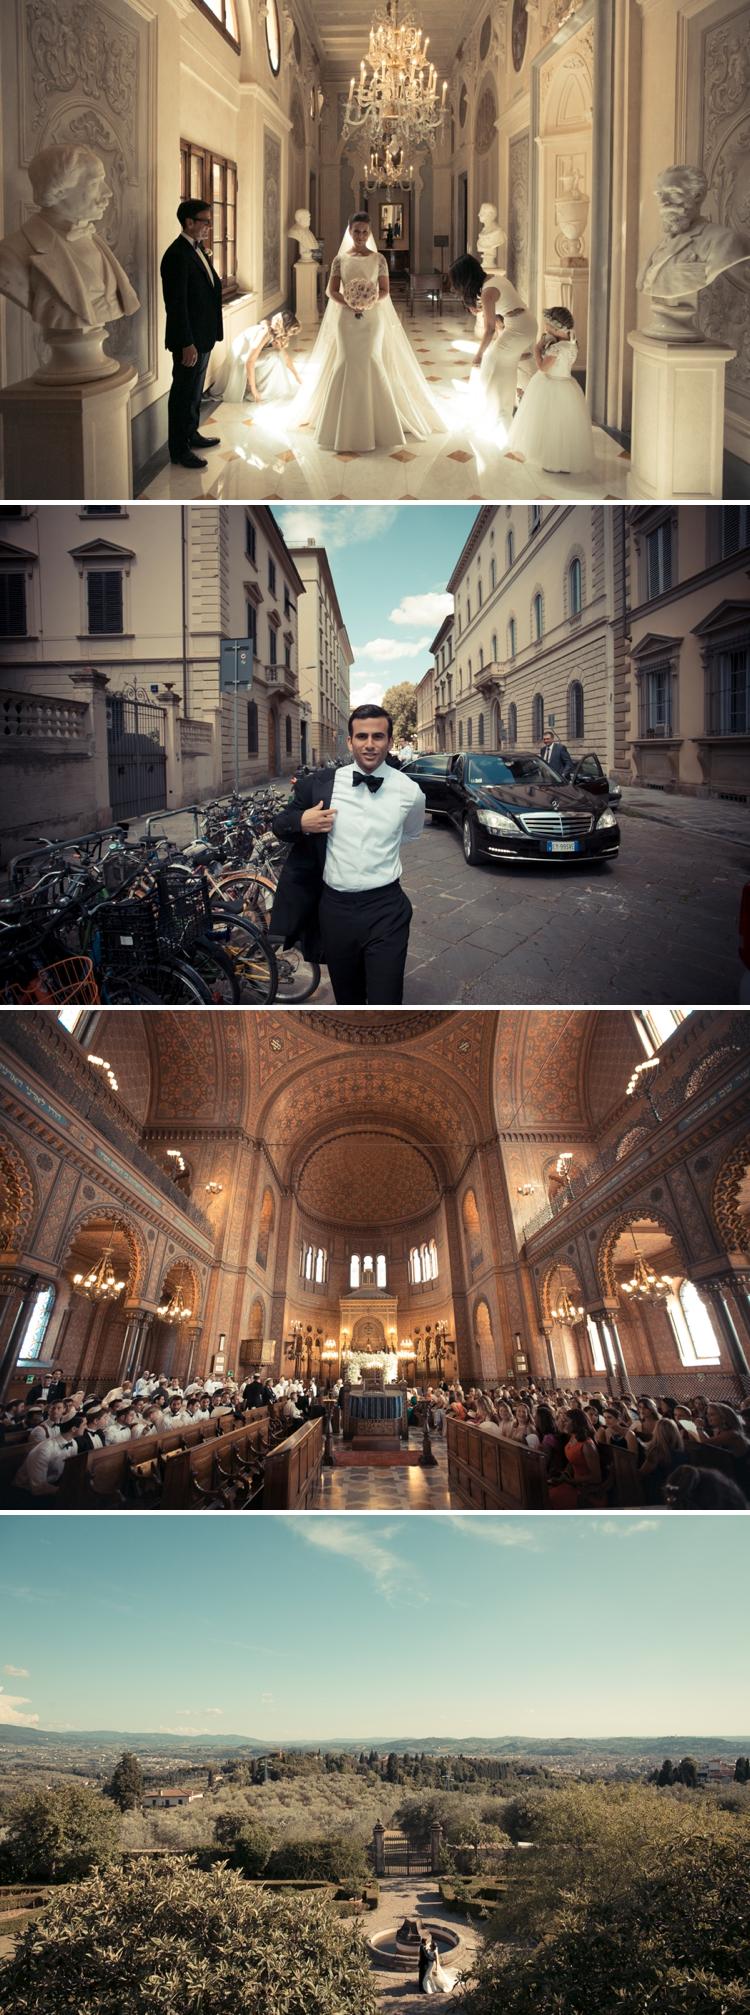 Jewish-wedding-Florence_0378 :: SMASHING THE GLASS :: Luxury wedding photography - 0 :: Jewish-wedding-Florence_0378